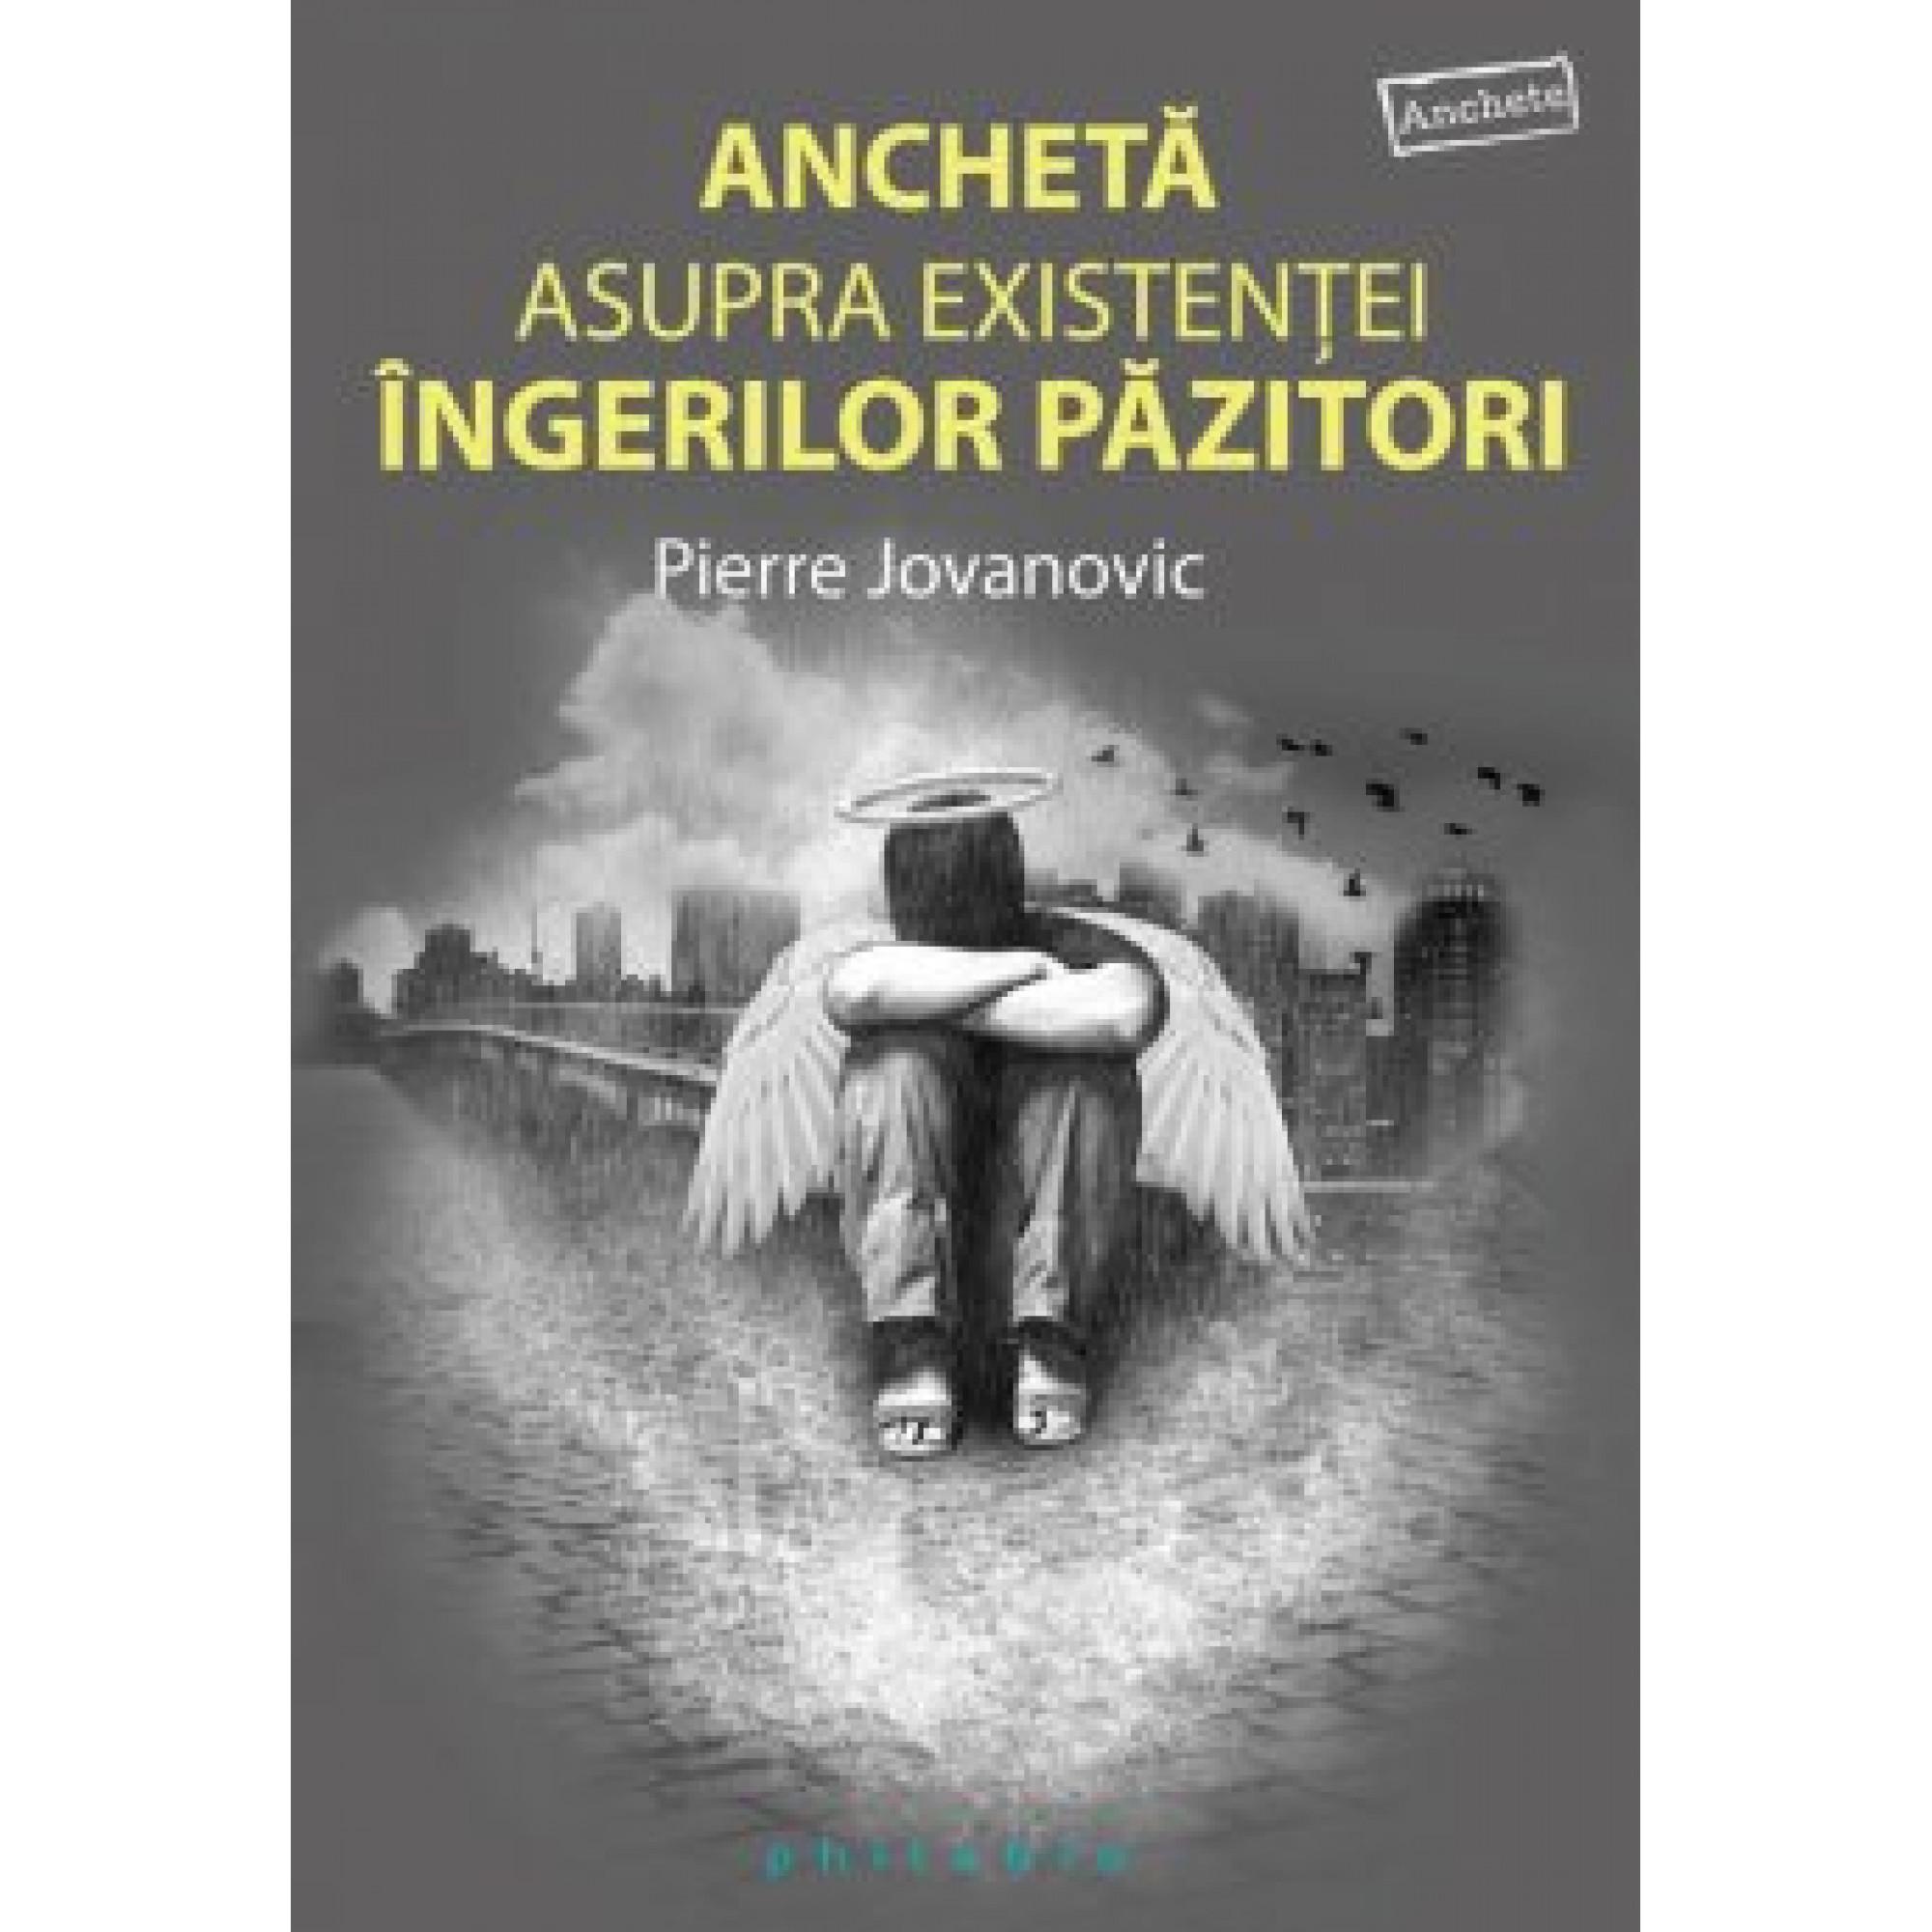 Ancheta asupra existenţei îngerilor păzitori; Pierre Jovanovic